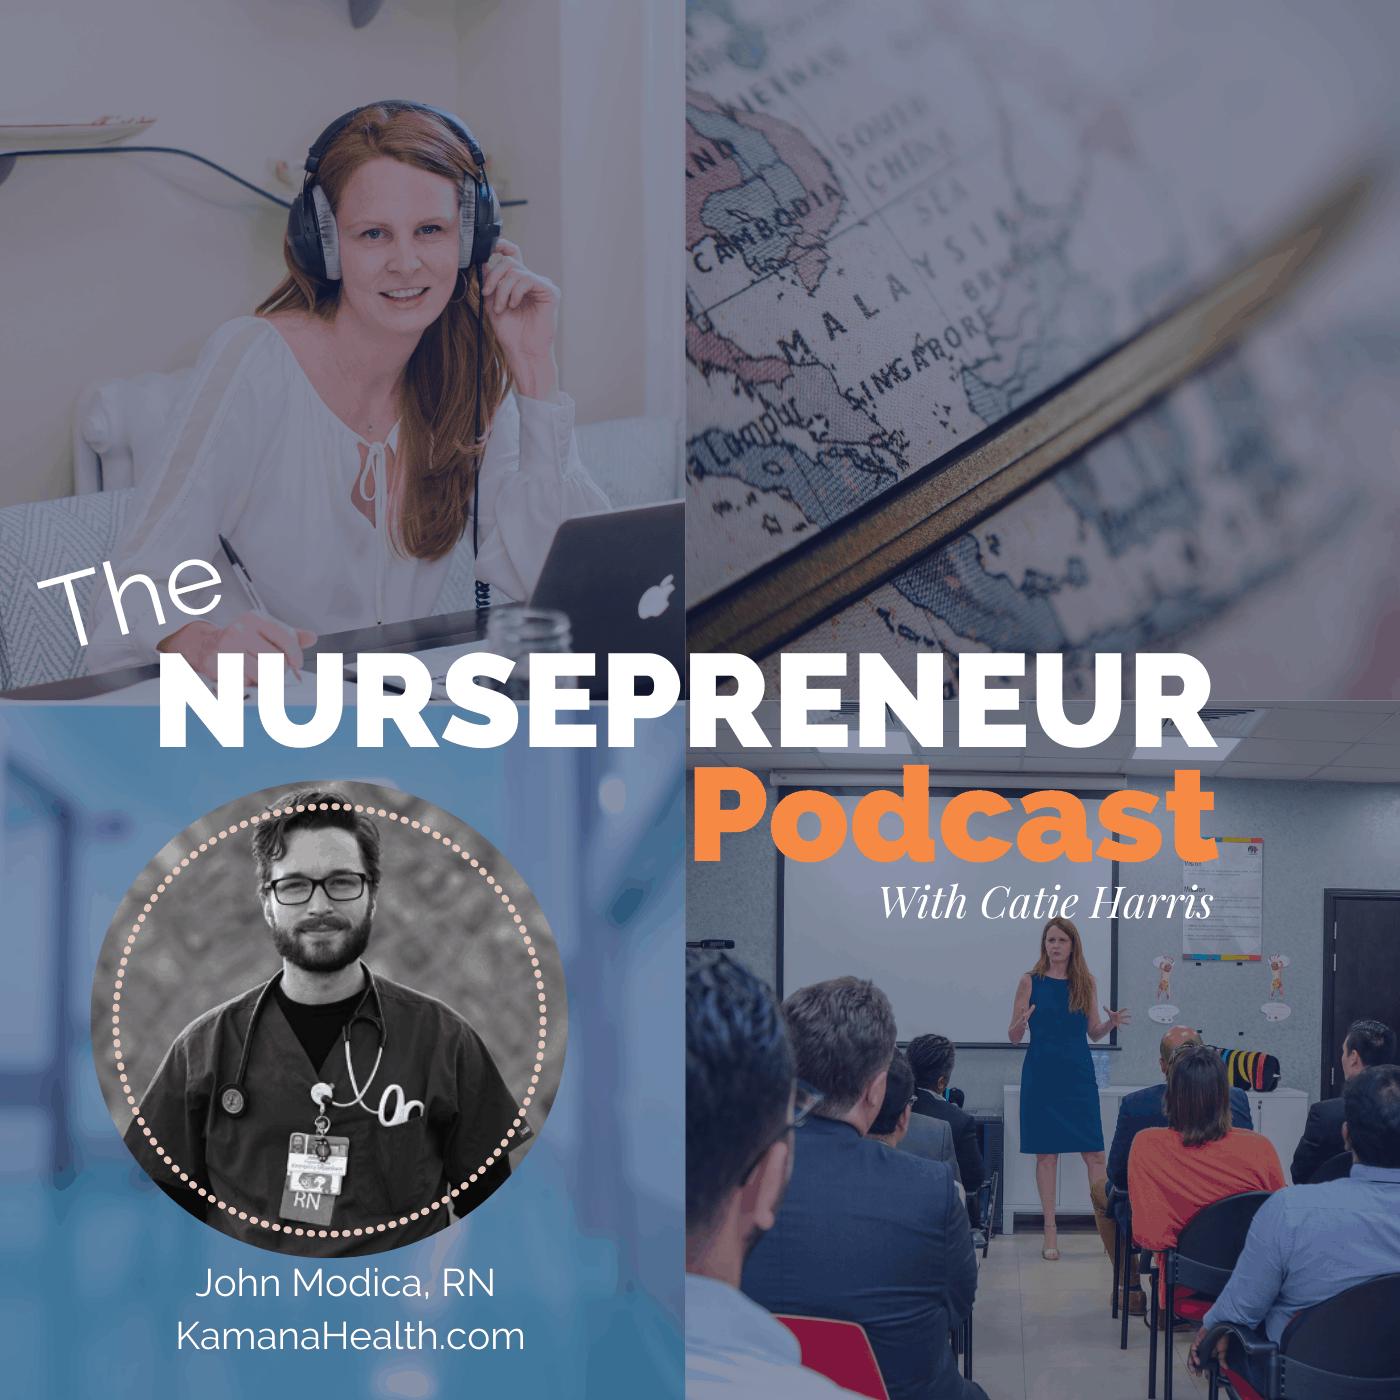 Kamana Health Platform NursePreneur Podcast